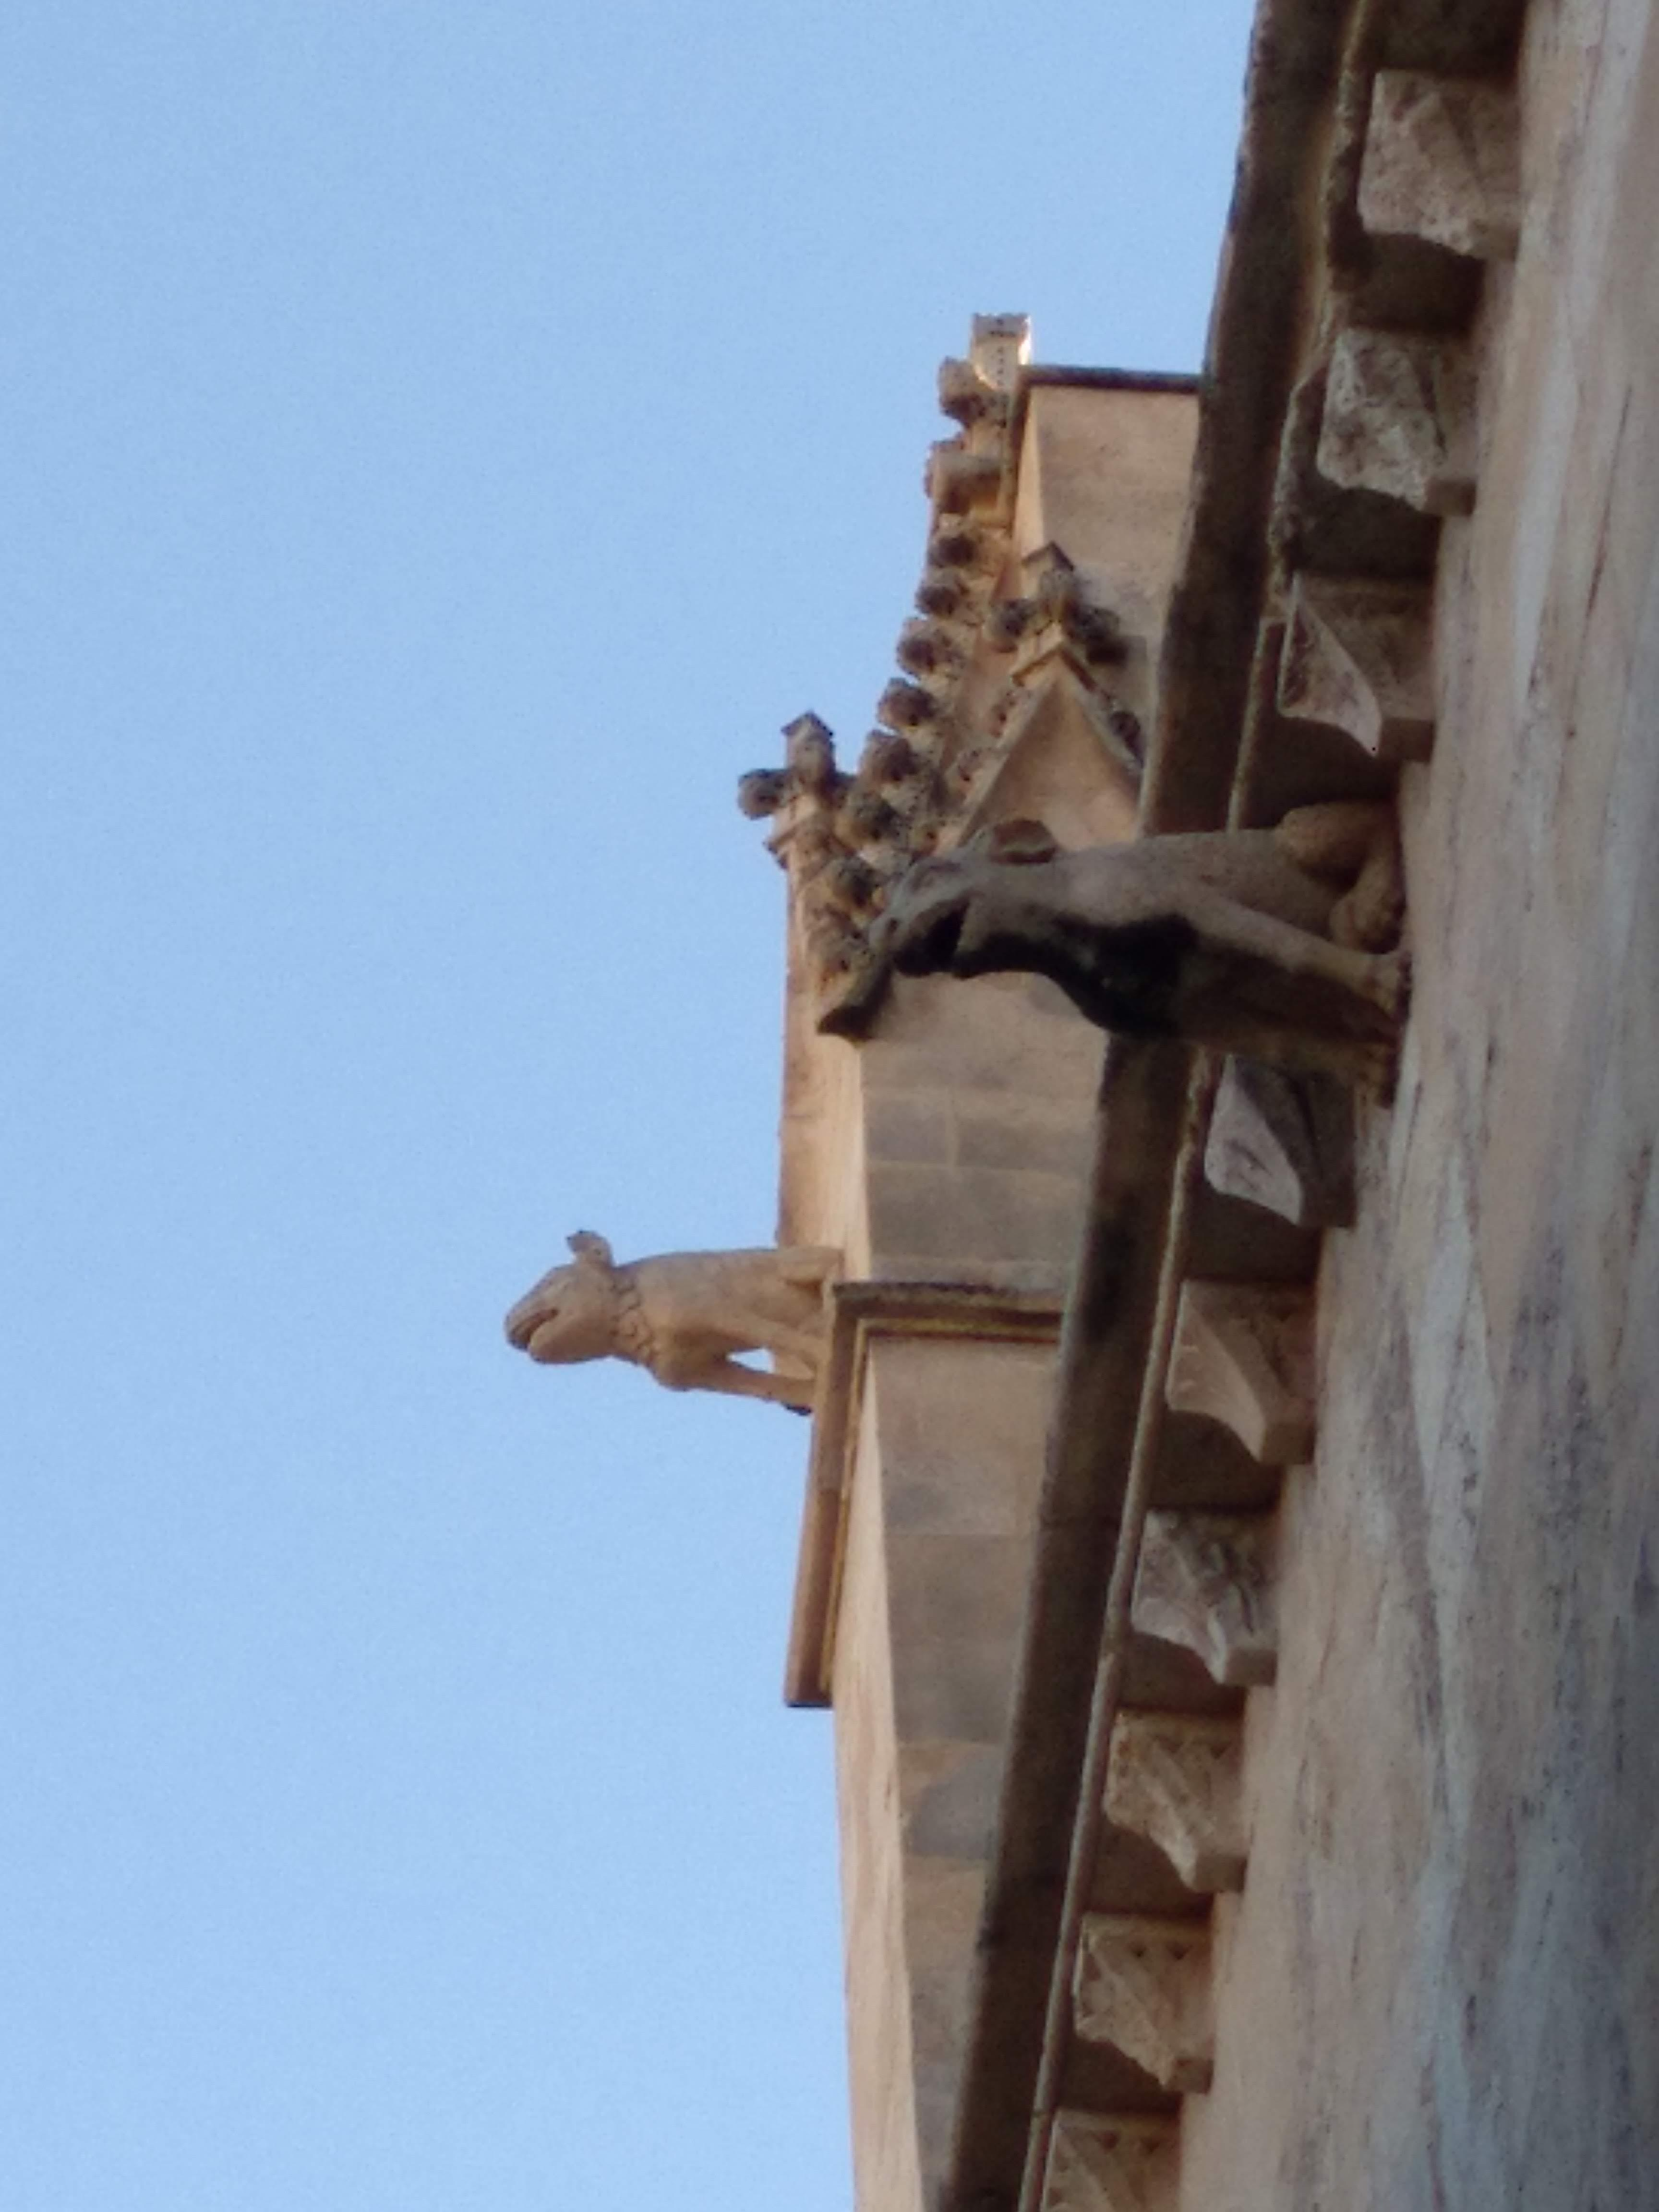 Fantastic-animals-of-Palma-5